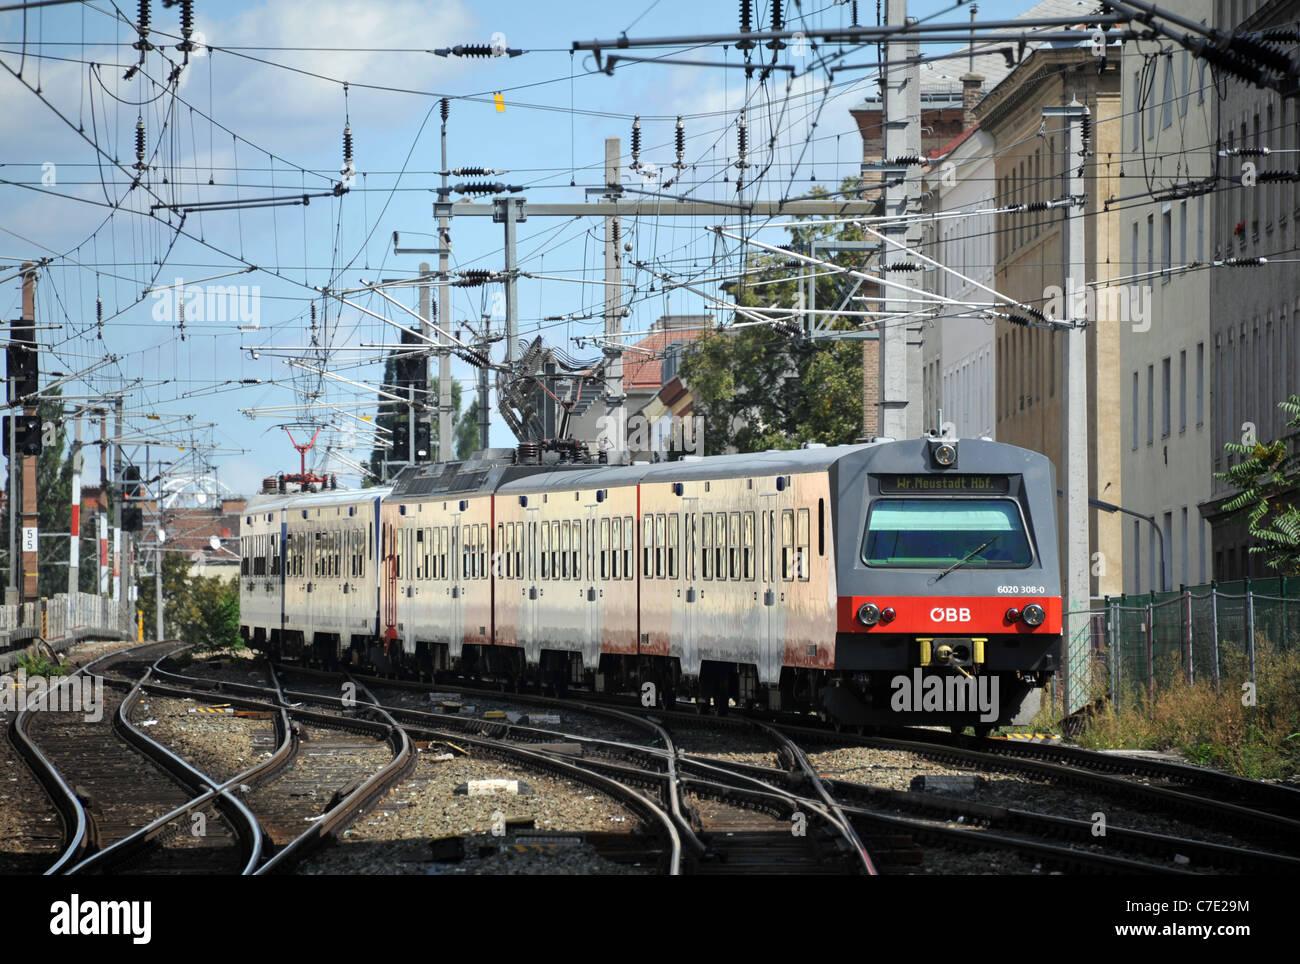 Railway, train, Vienna, Austria - Stock Image